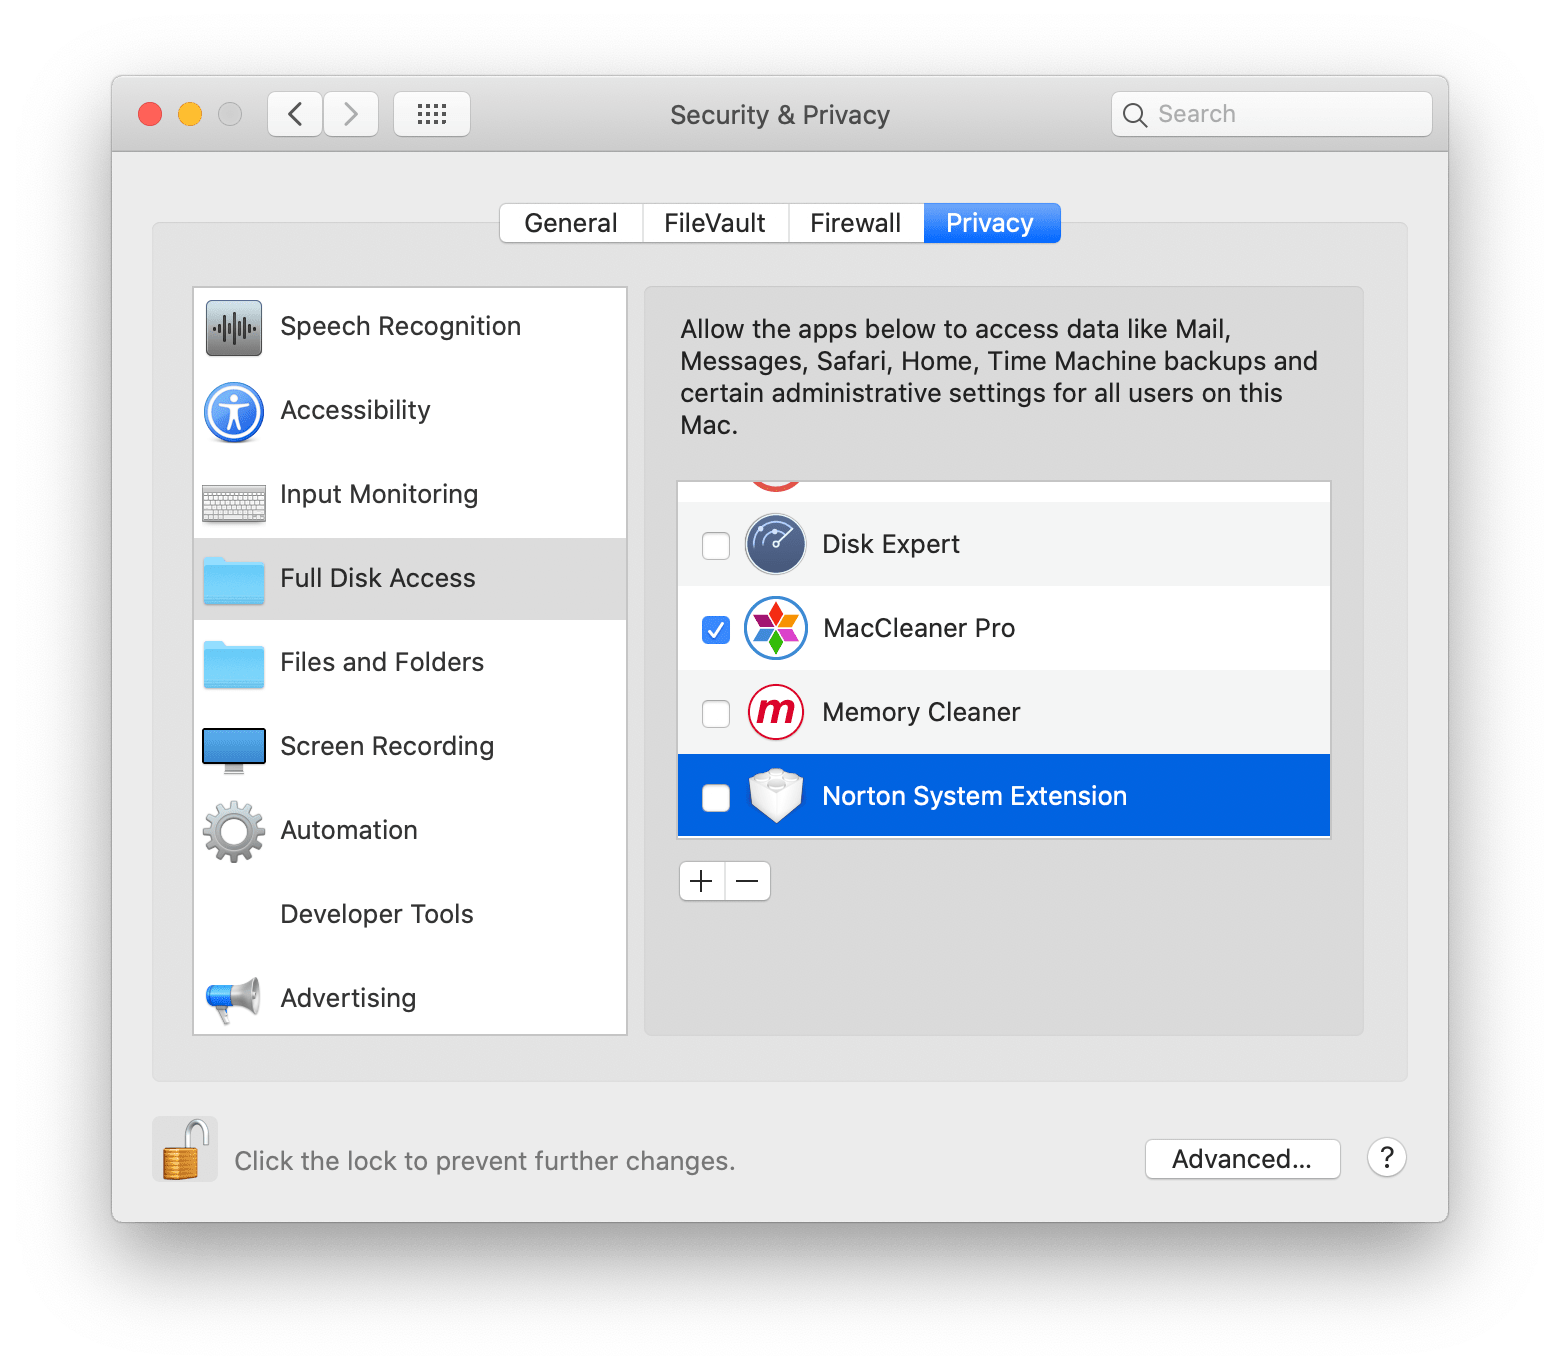 Full Disk Access MacCleaner Pro